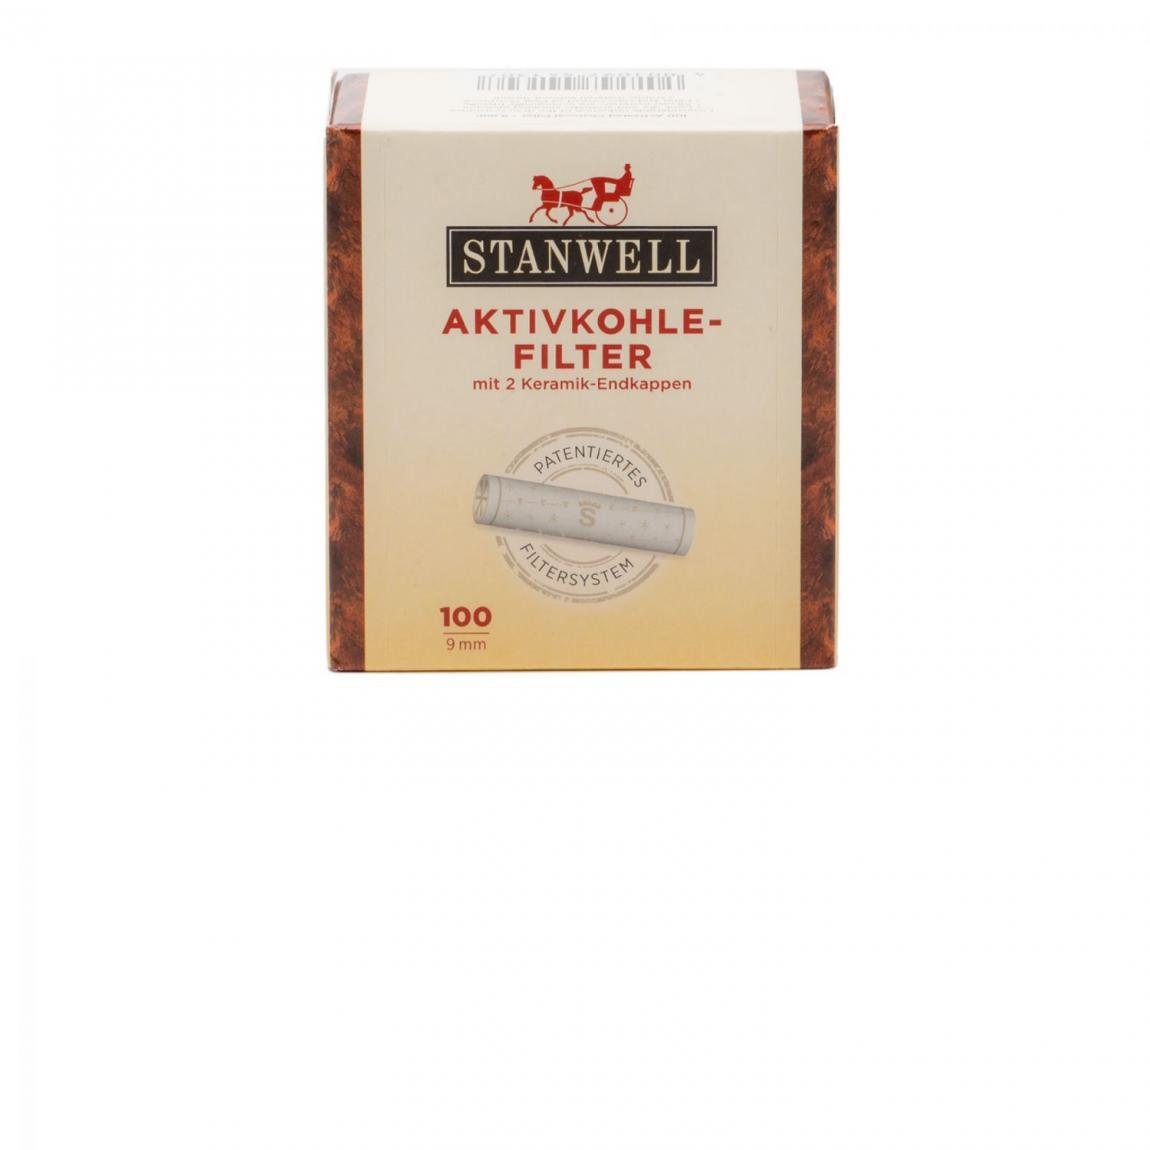 Stanwell Aktivkohle-Filter 9mm 1x100 Stück